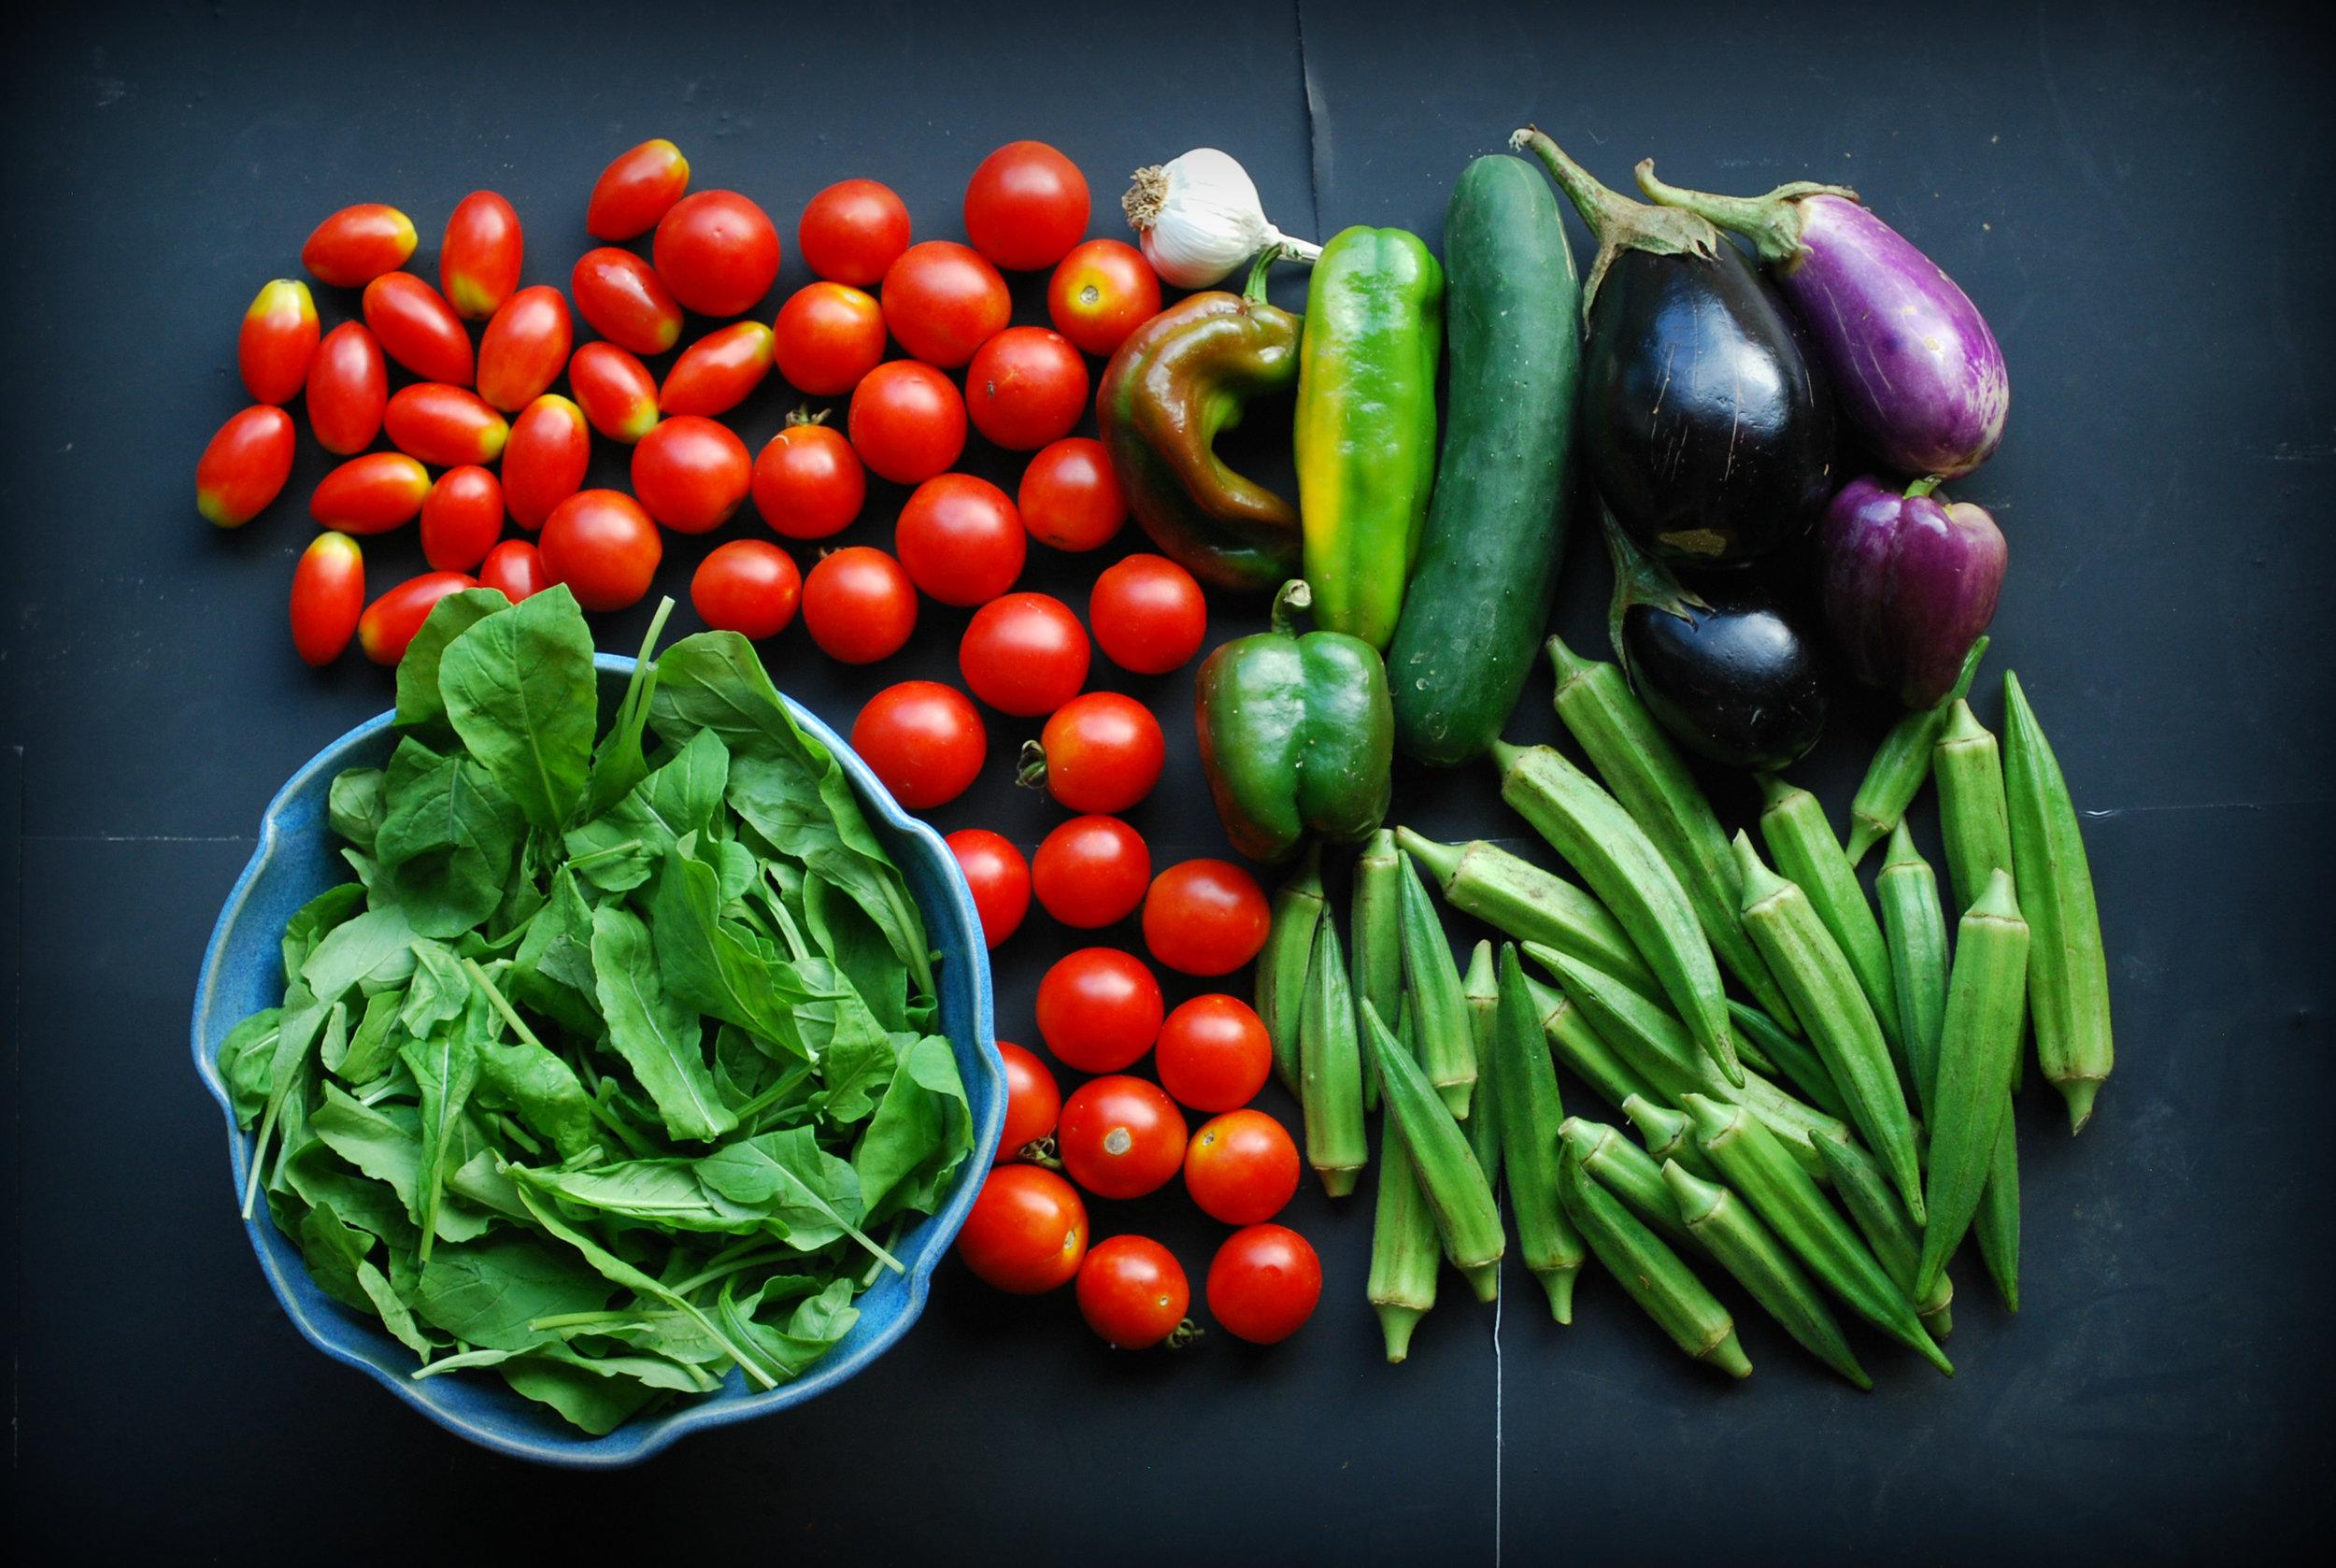 Week 19: Arugula, Campari tomatoes, Juliet tomatoes, garlic, bell peppers, okra, eggplant, cucumber.